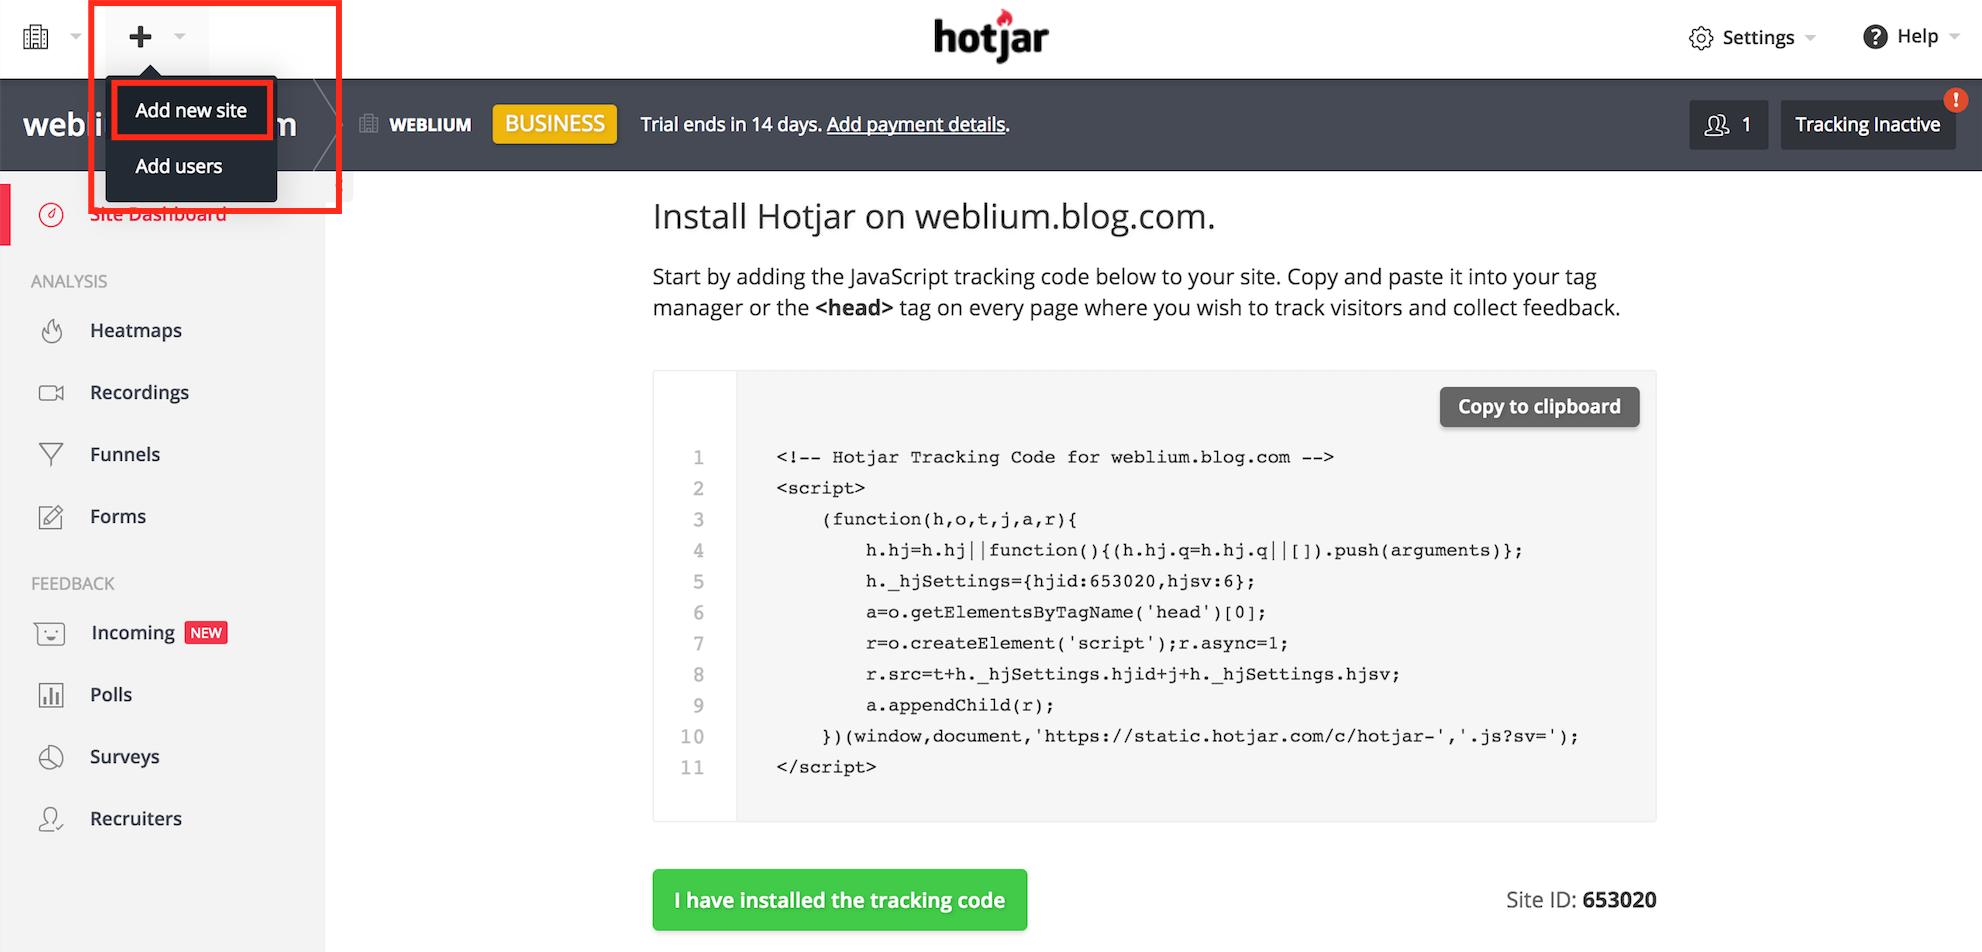 Add new site on Hotjar